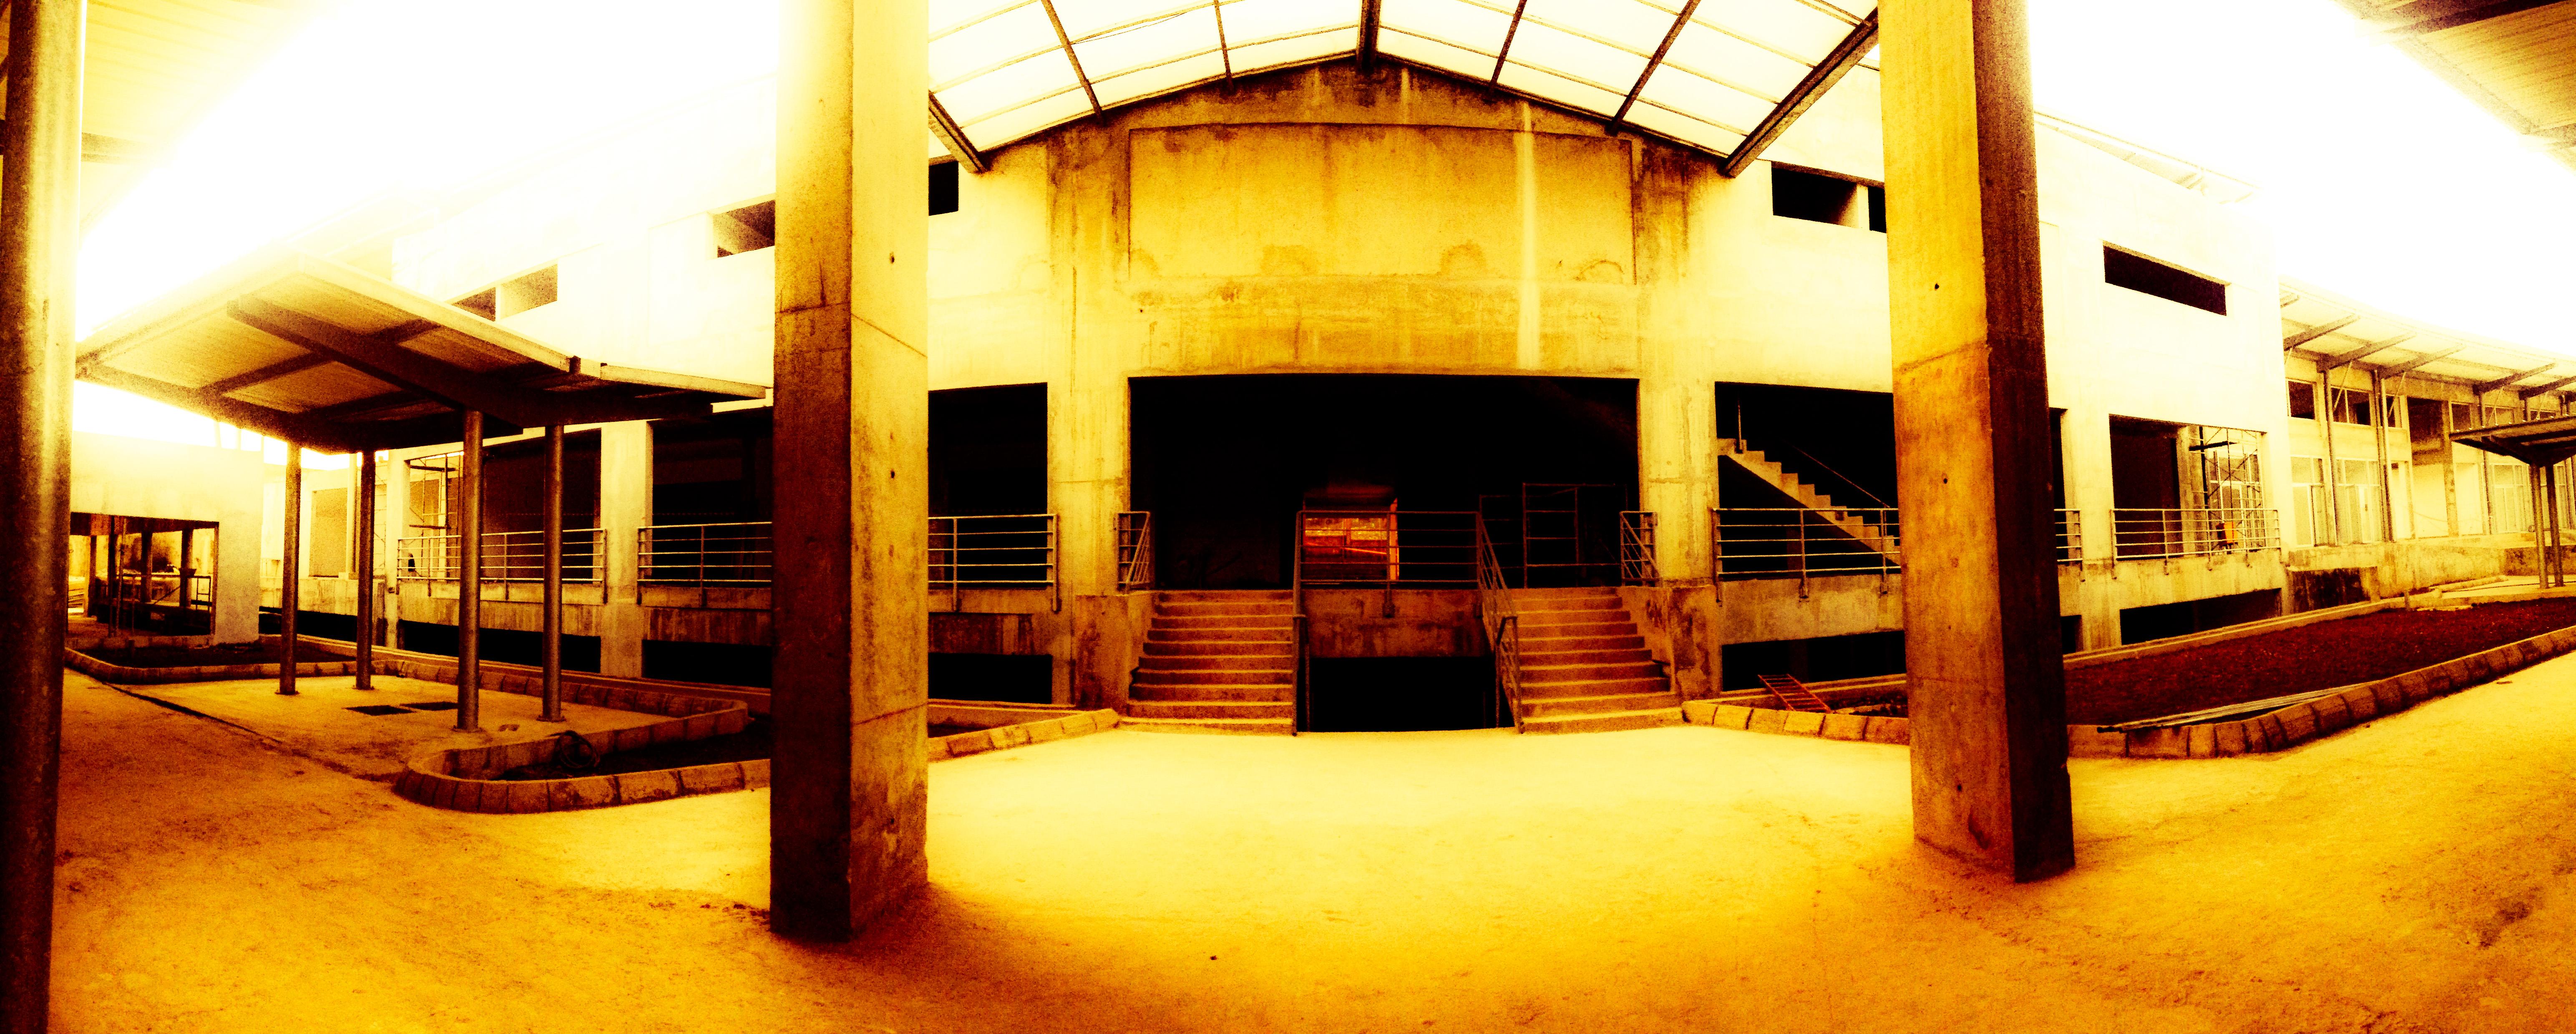 Galerie principale